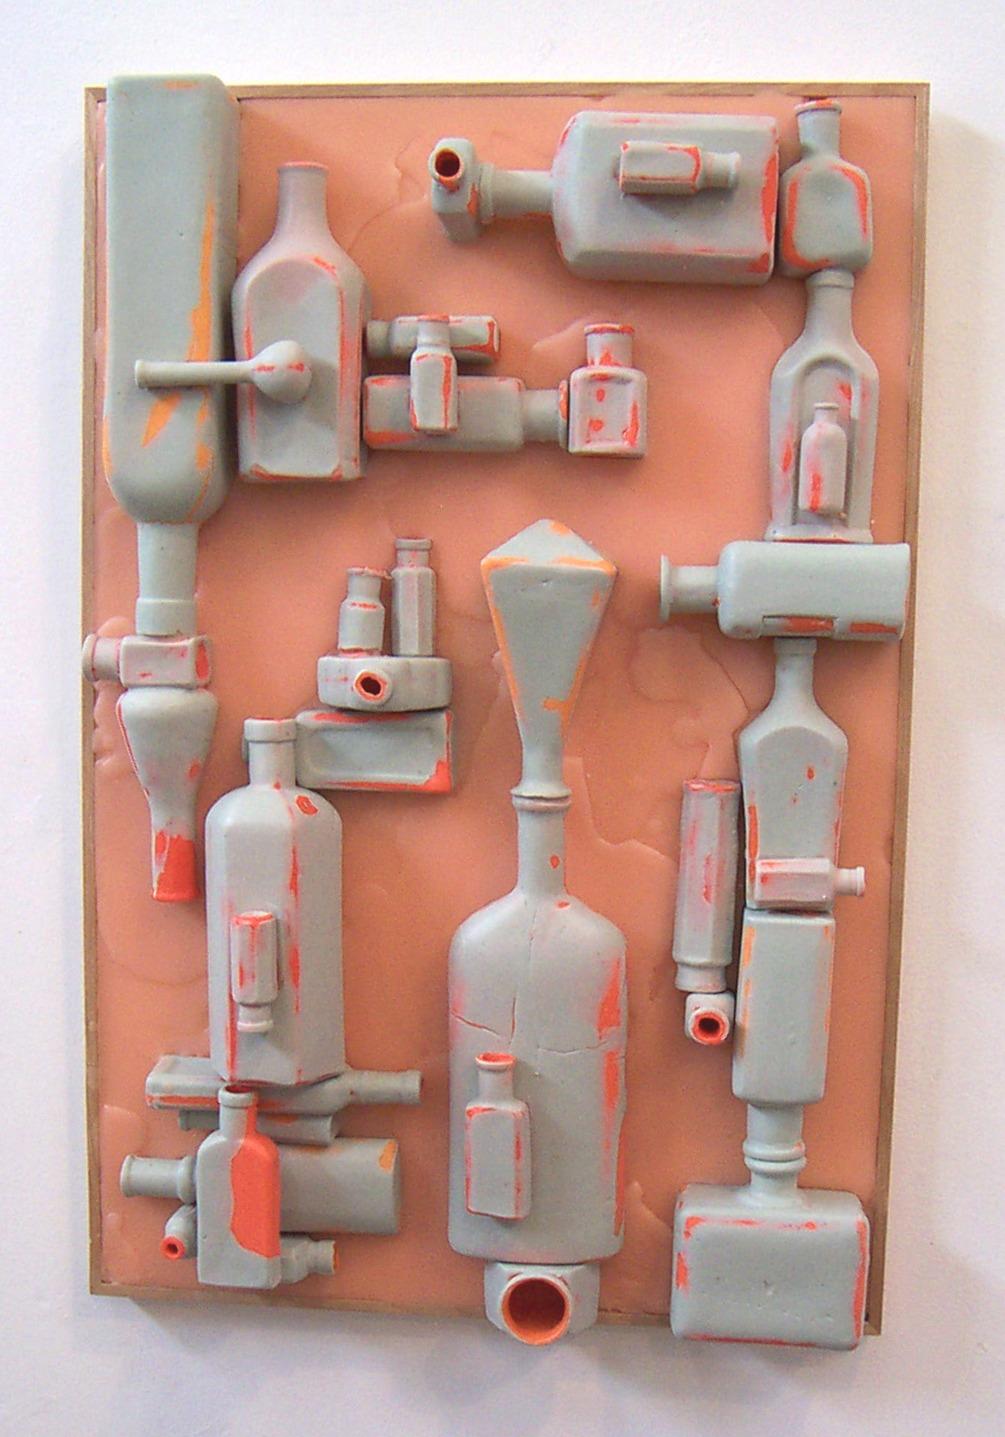 Balancing Act 2:     Skin Deep  ,  2005, wax, wood, pigment, 24 x 16 x 5 inches